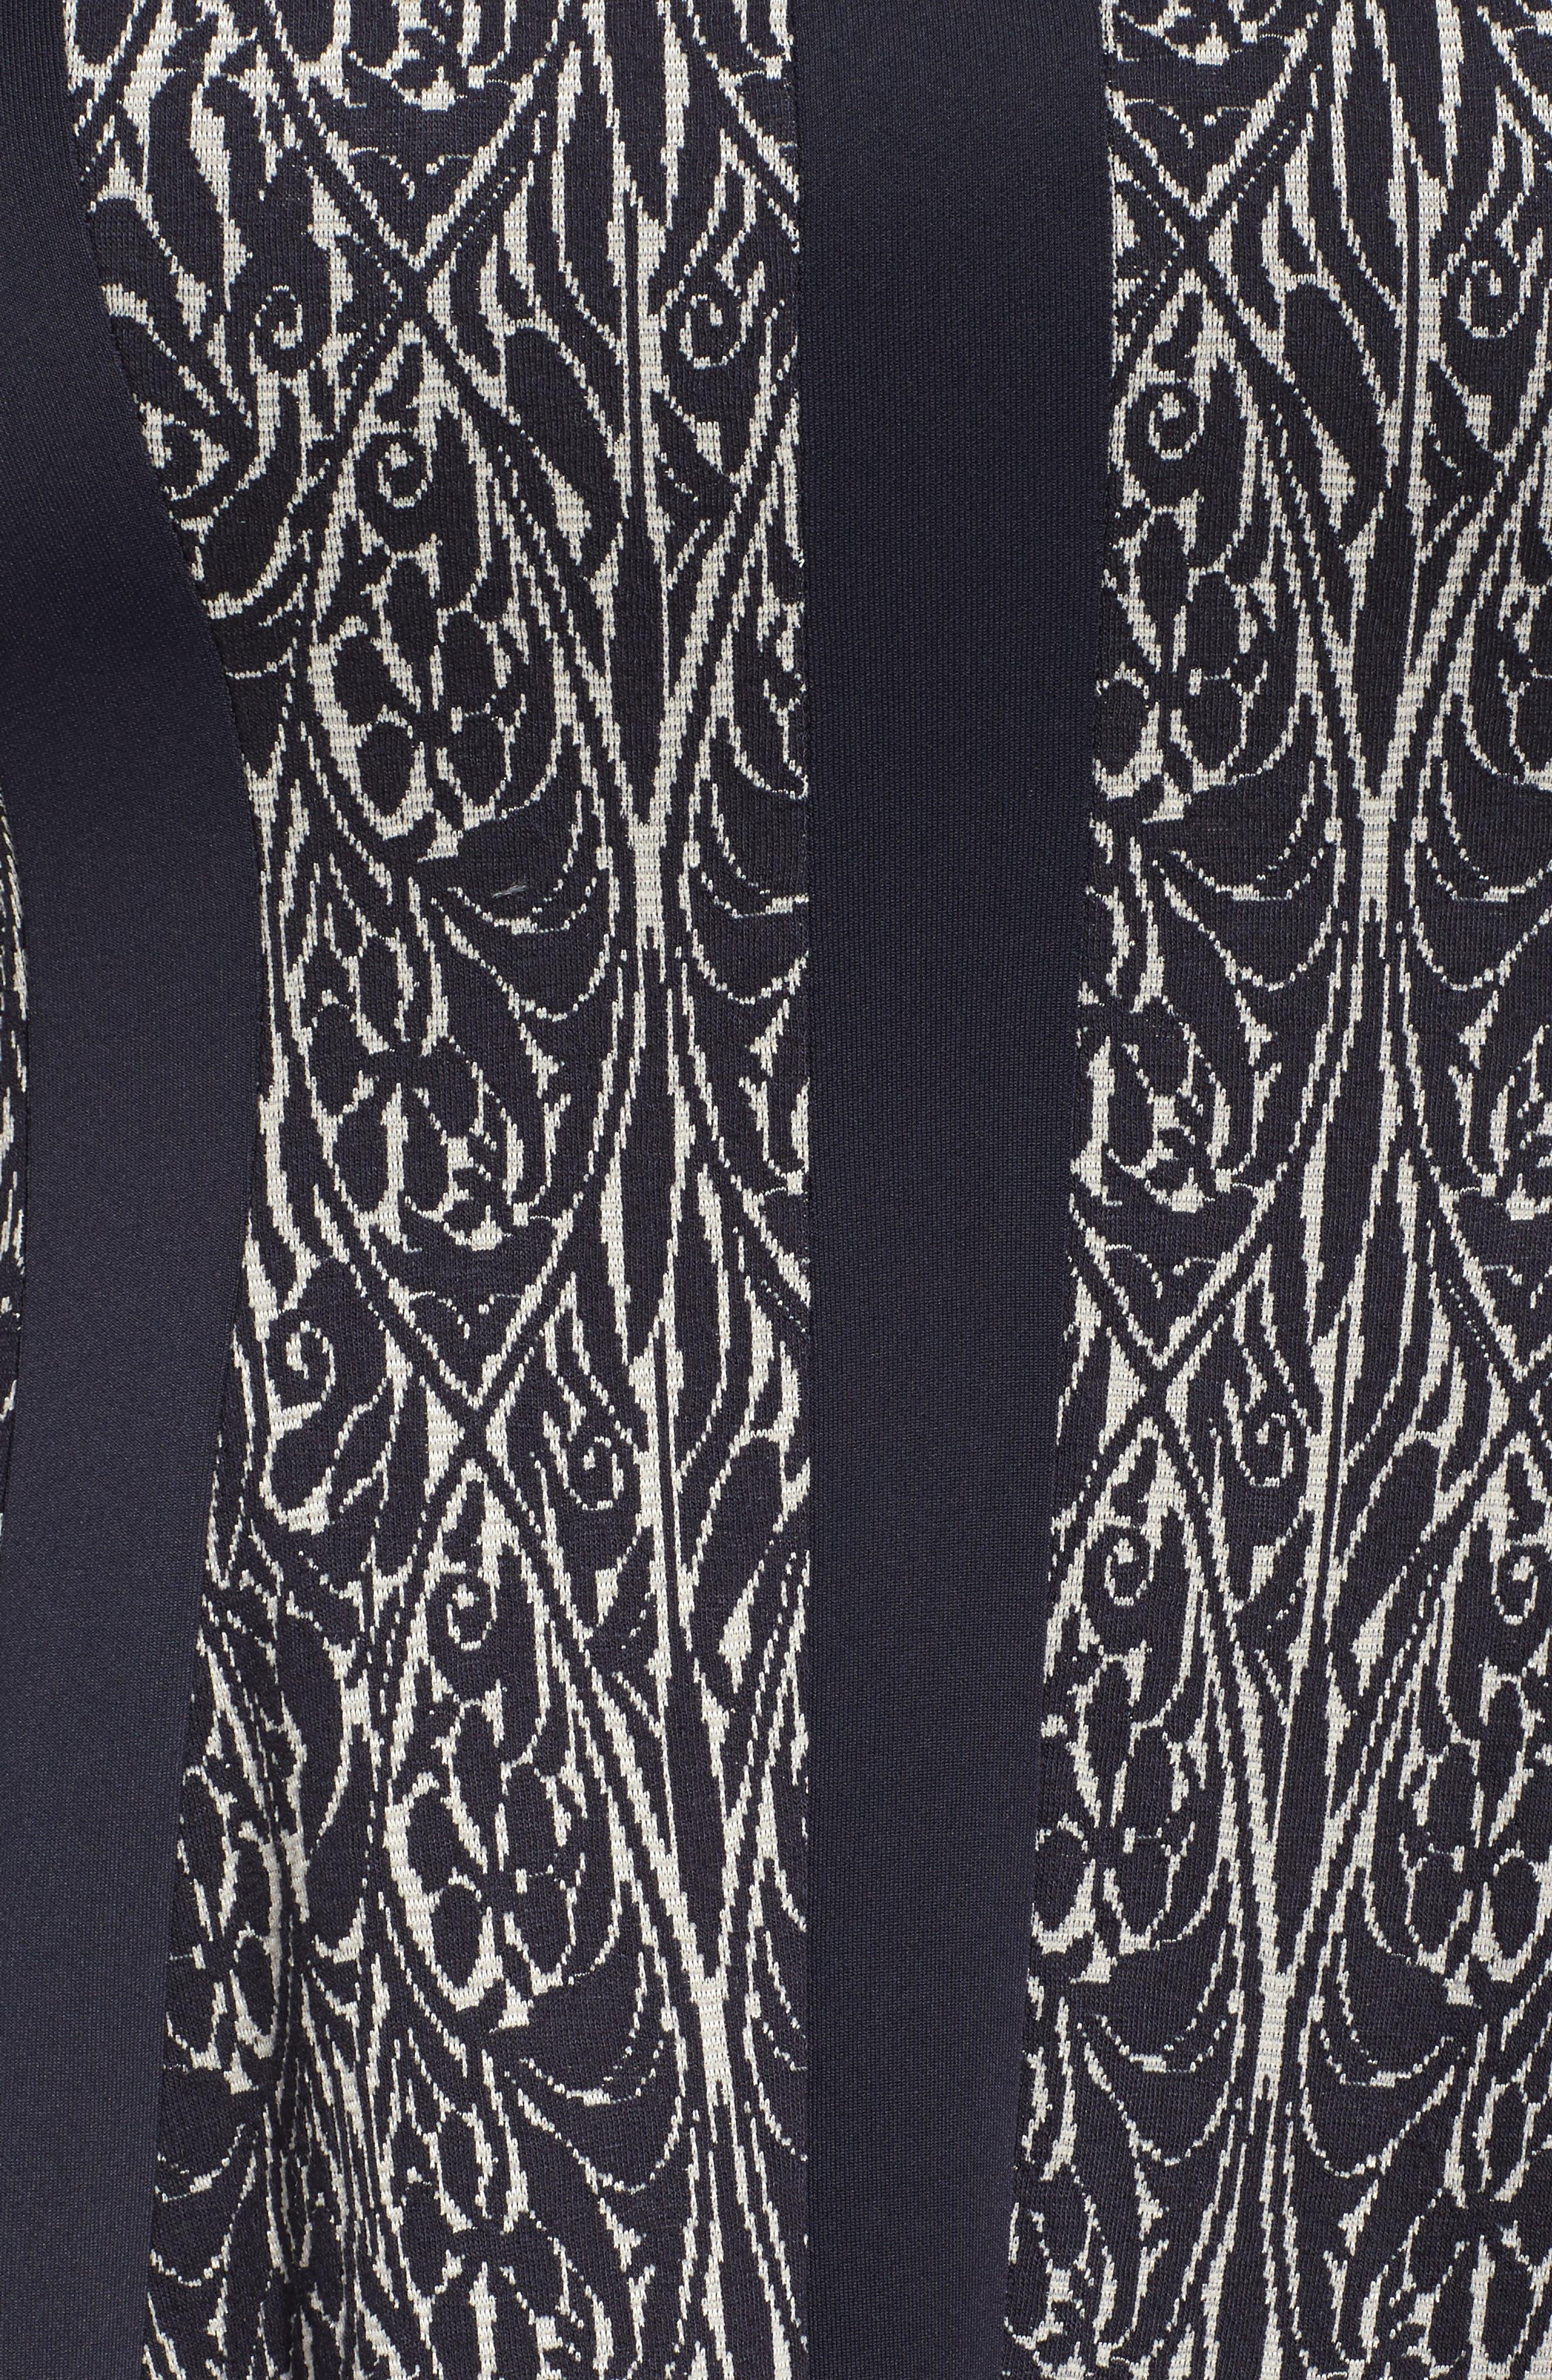 Jacquard Knit A-Line Dress,                             Alternate thumbnail 5, color,                             Navy/ Ivory